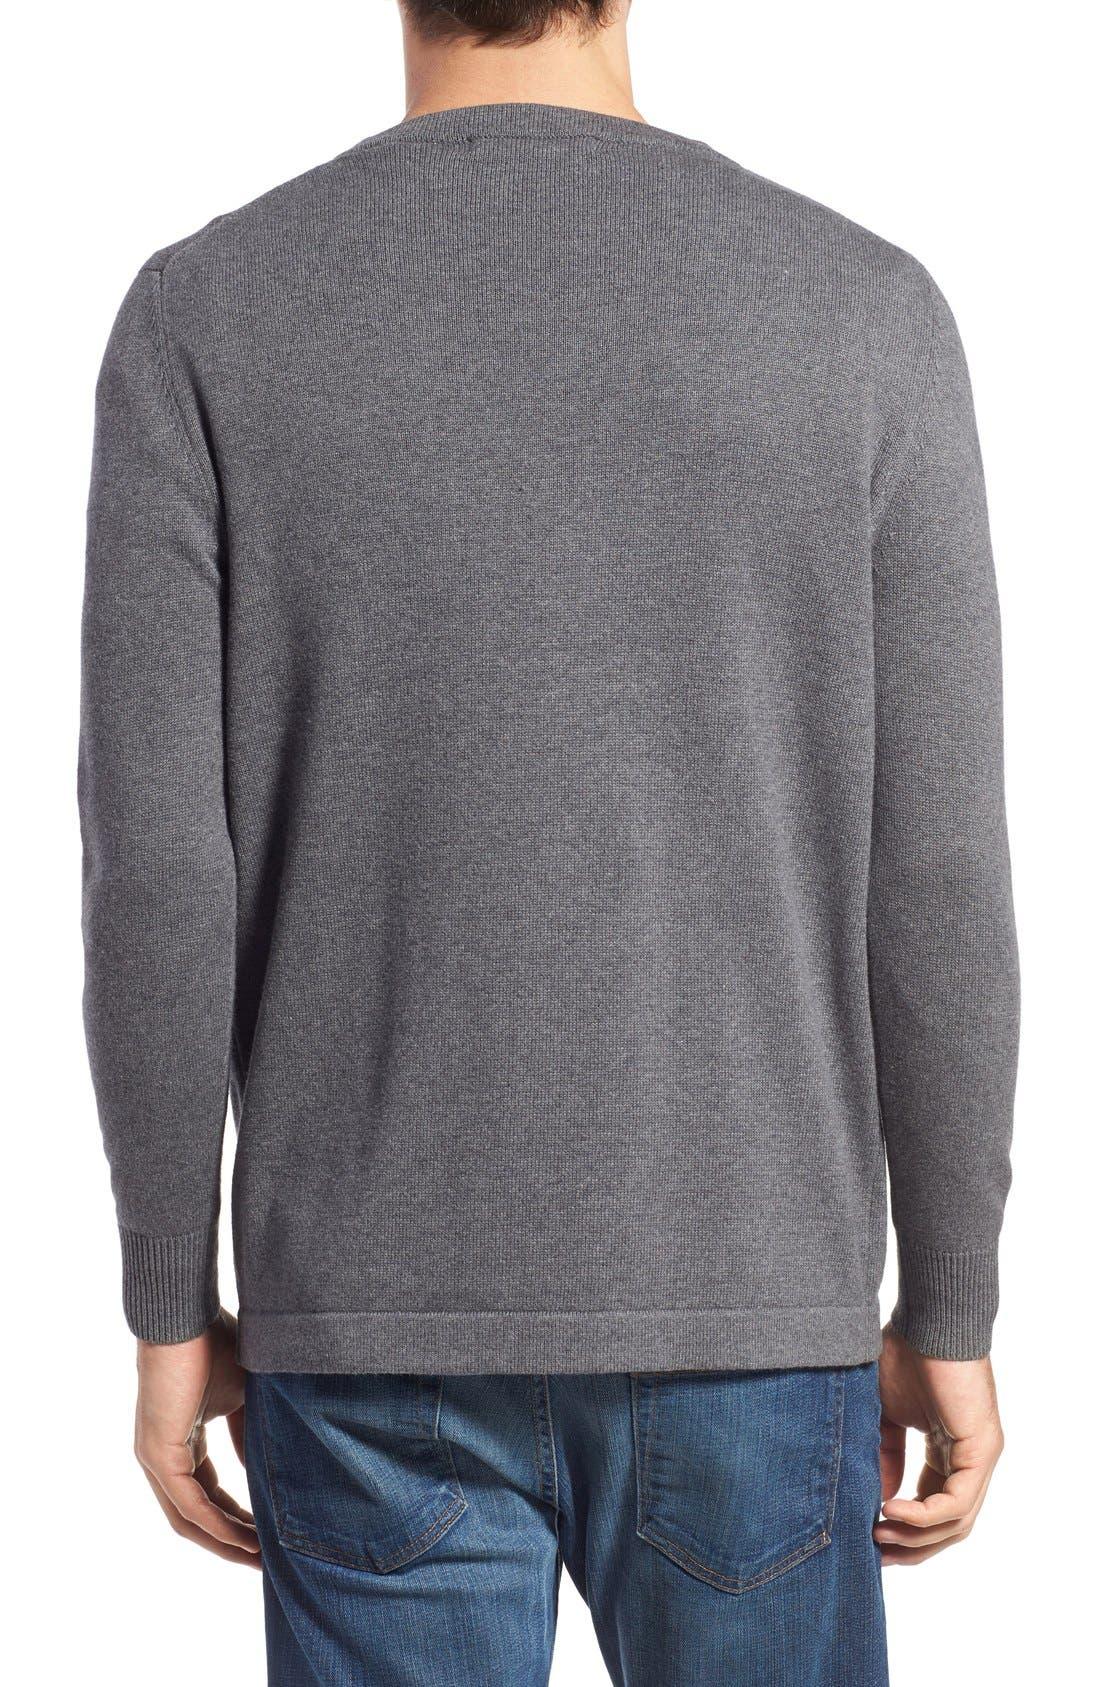 'San Francisco' Crewneck Sweater,                             Alternate thumbnail 2, color,                             Ash